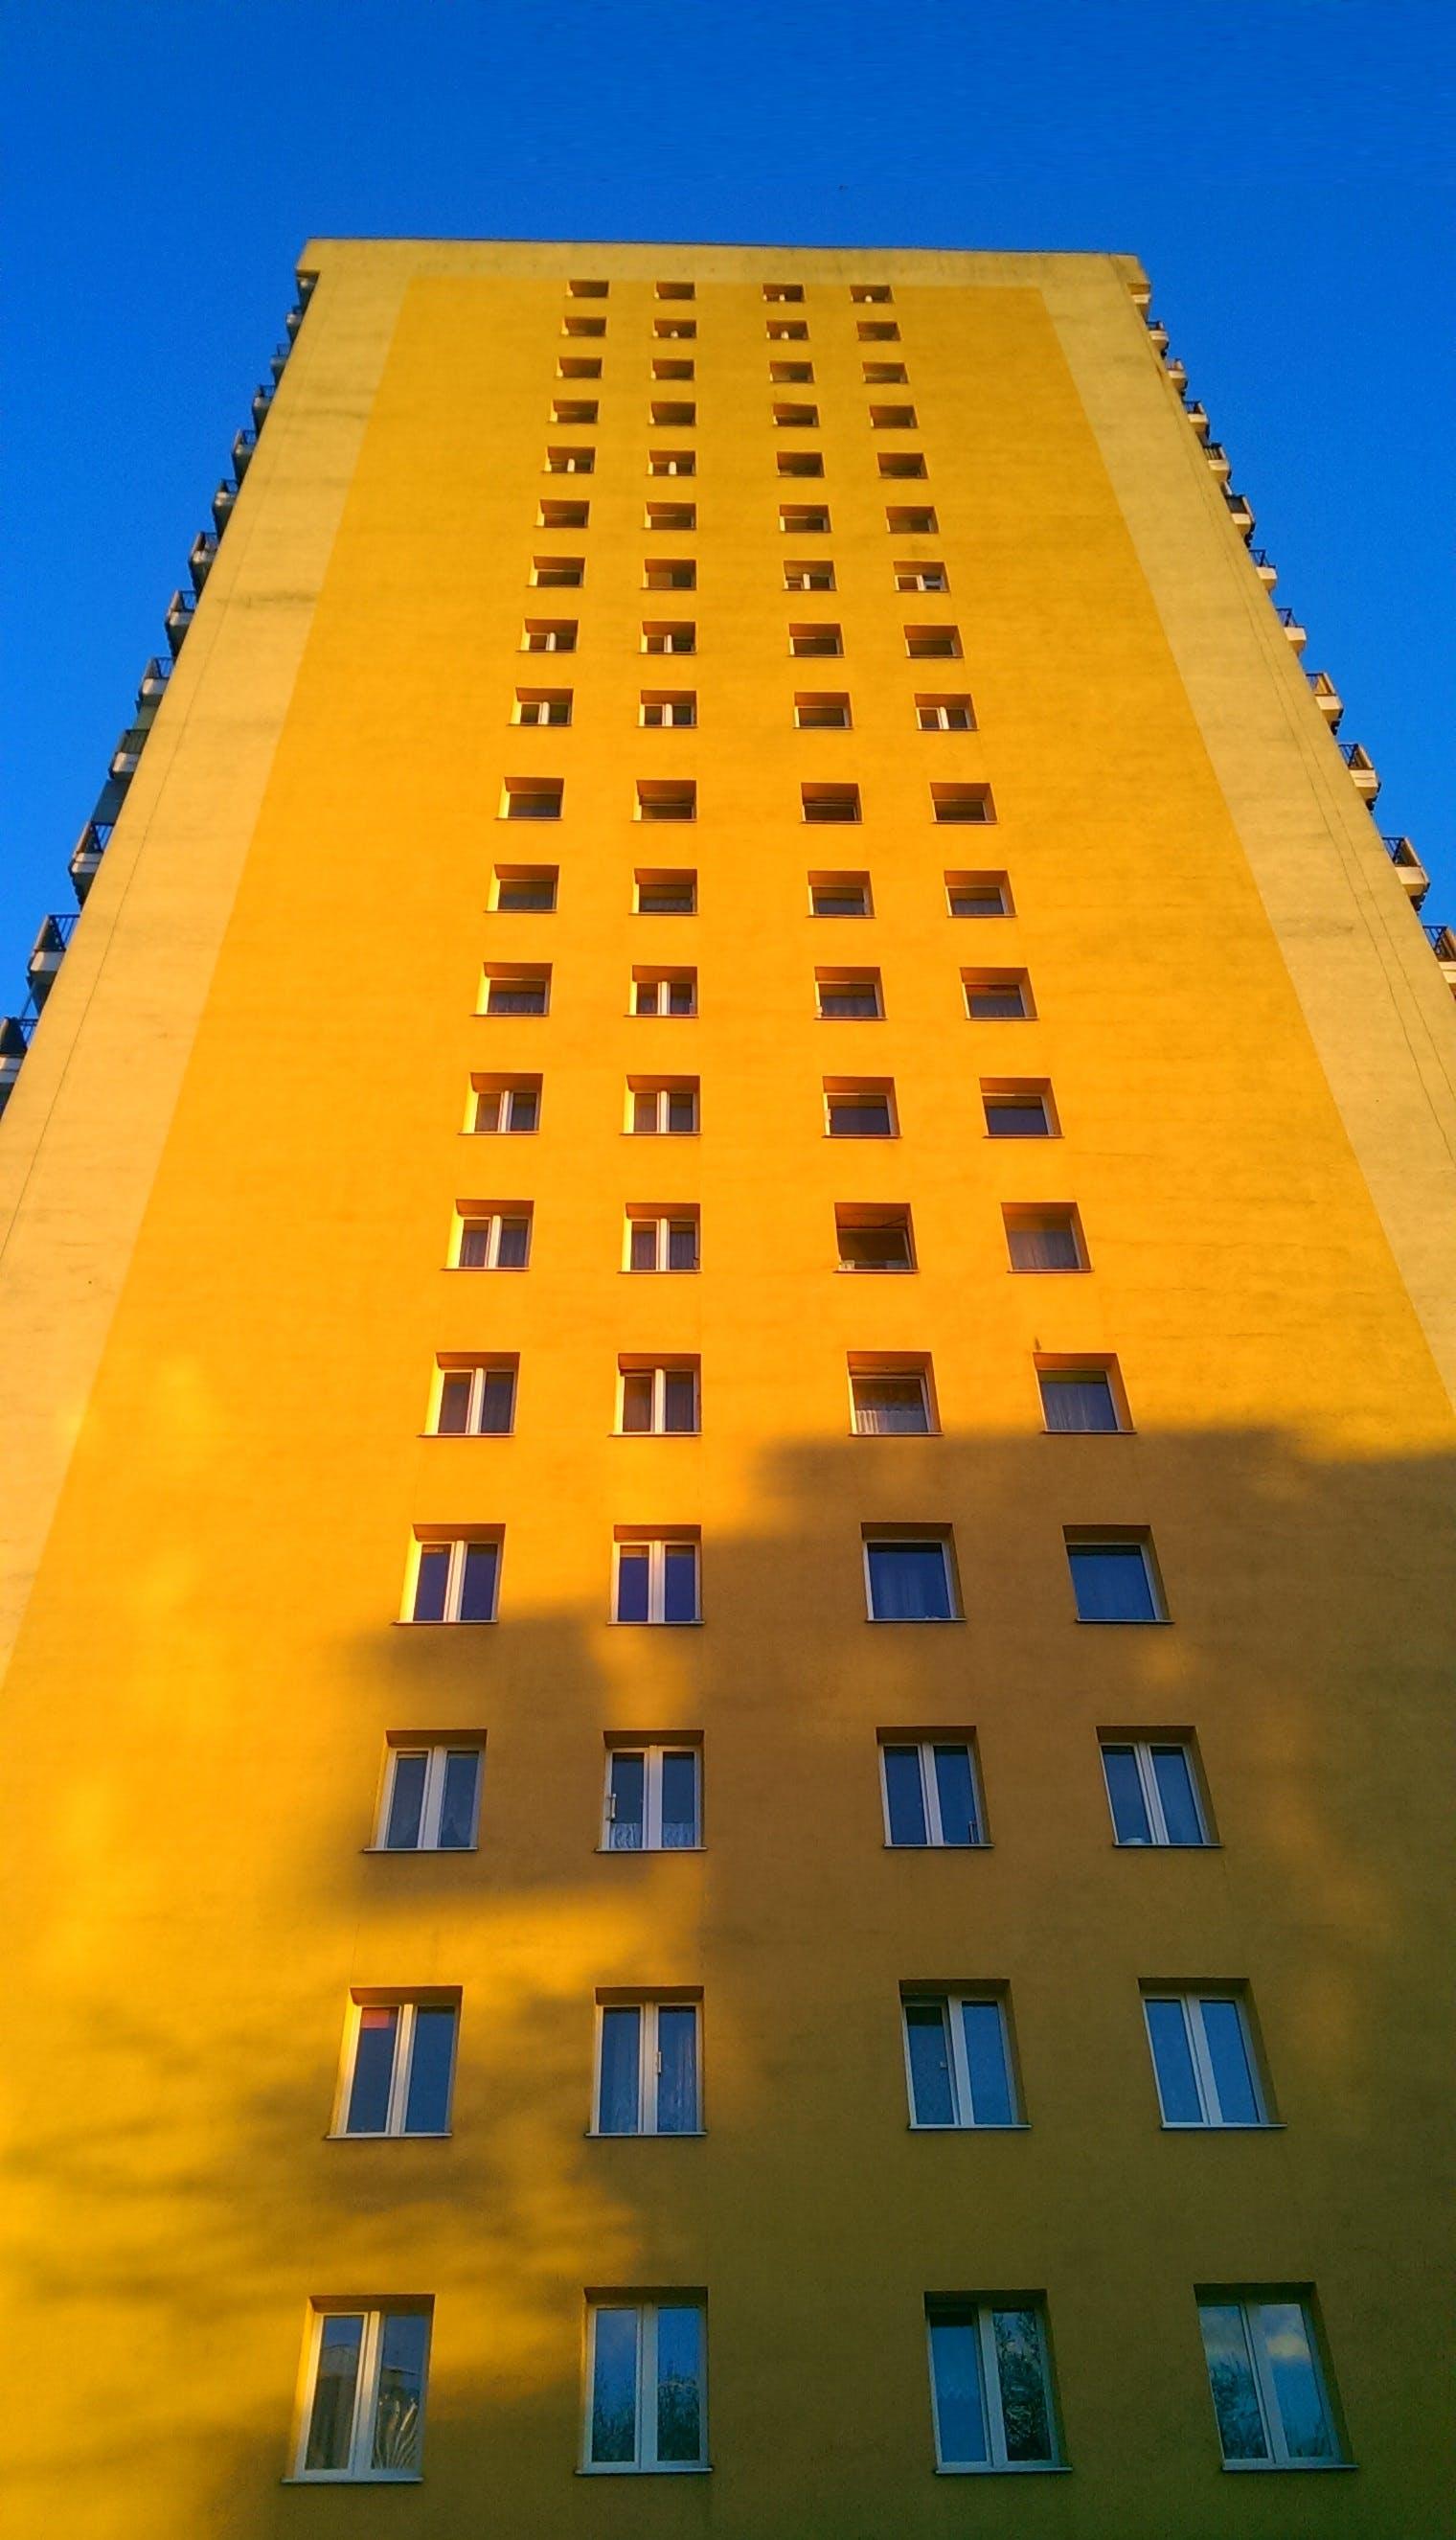 Free stock photo of block, flats